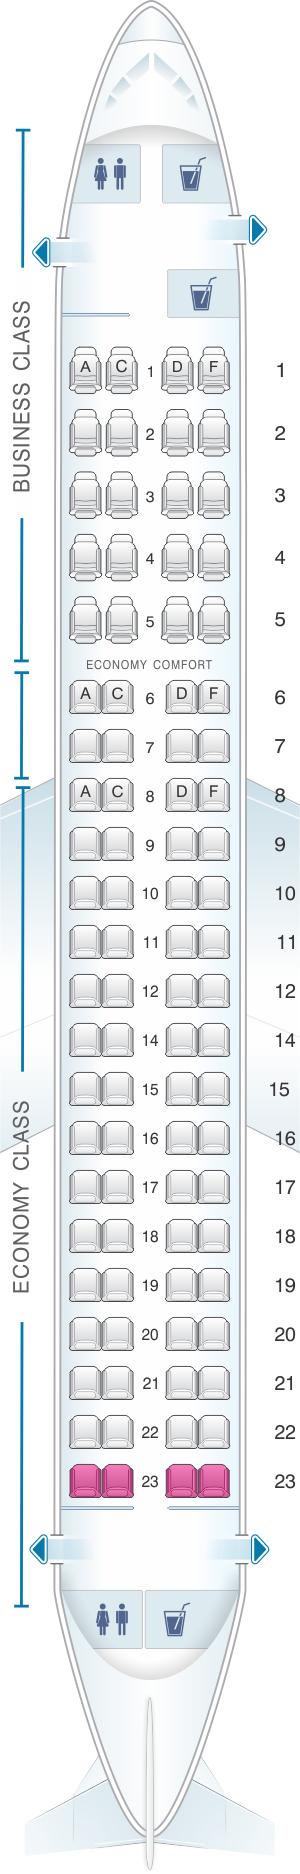 Seat Map Klm Embraer 175 Seatmaestro Com